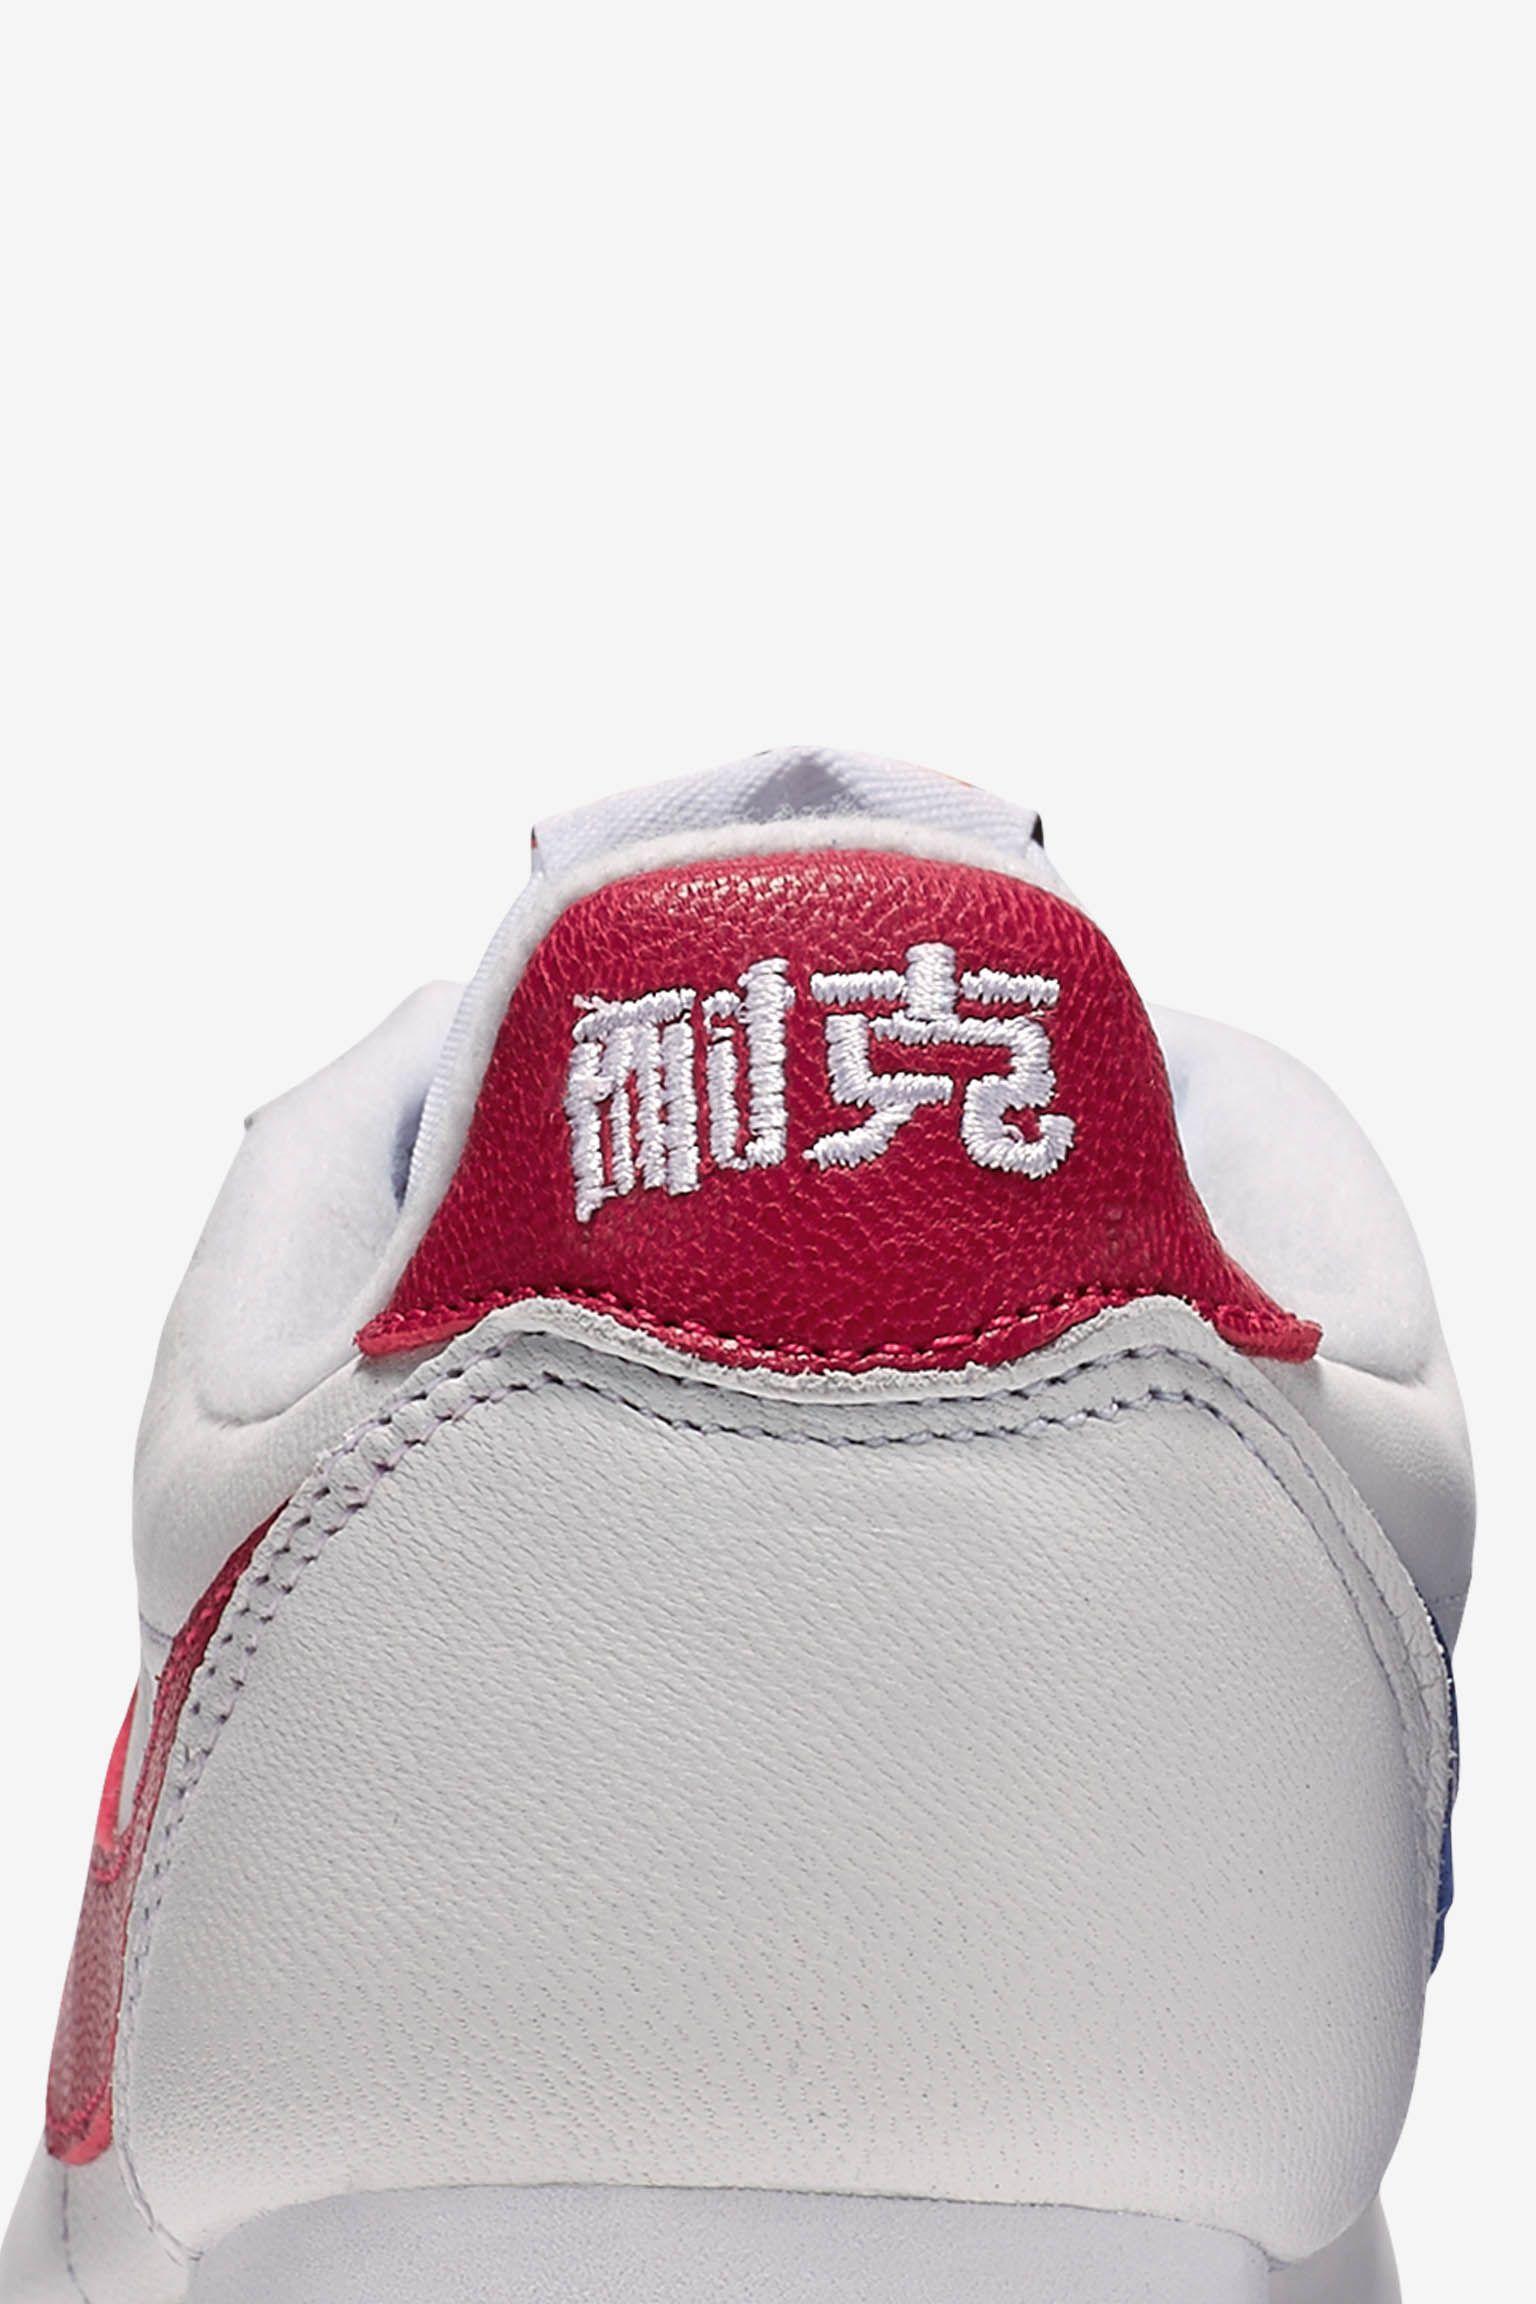 Women's Nike Classic Cortez Leather 'Nai Ke'